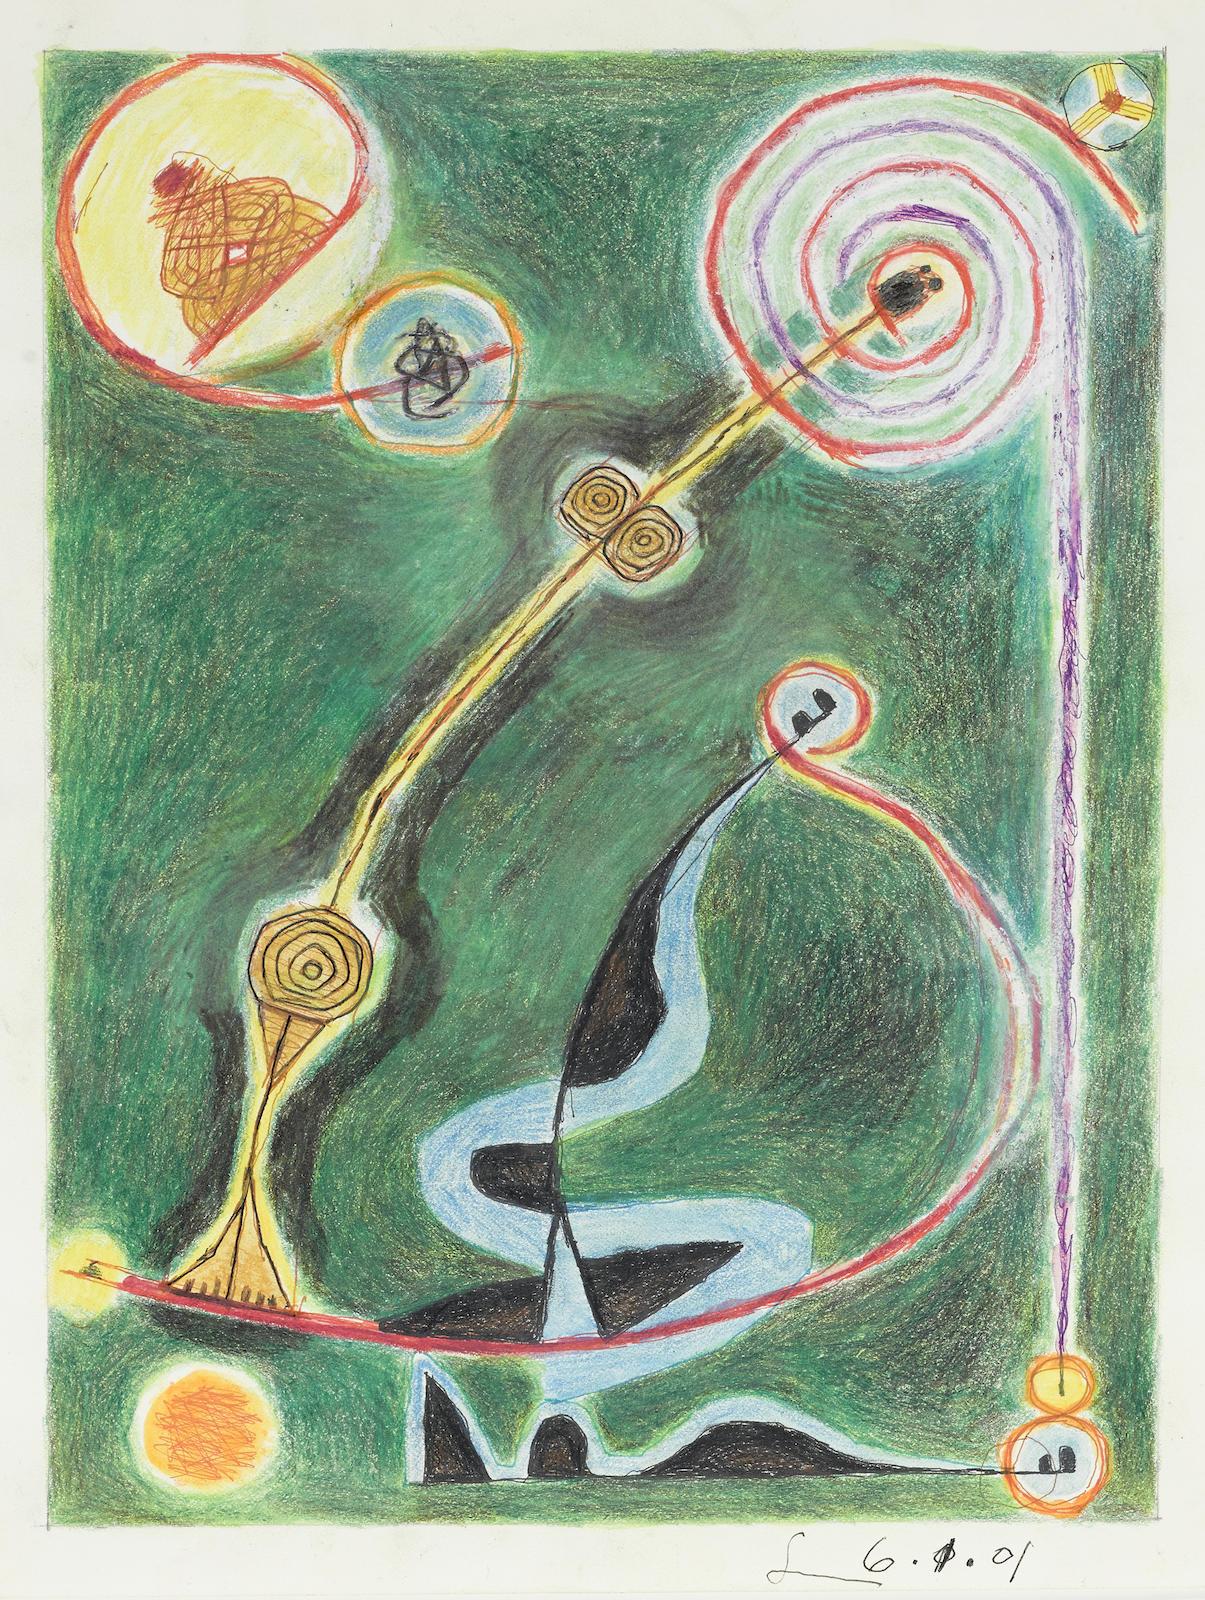 Frank Lobdell-Untitled-2001